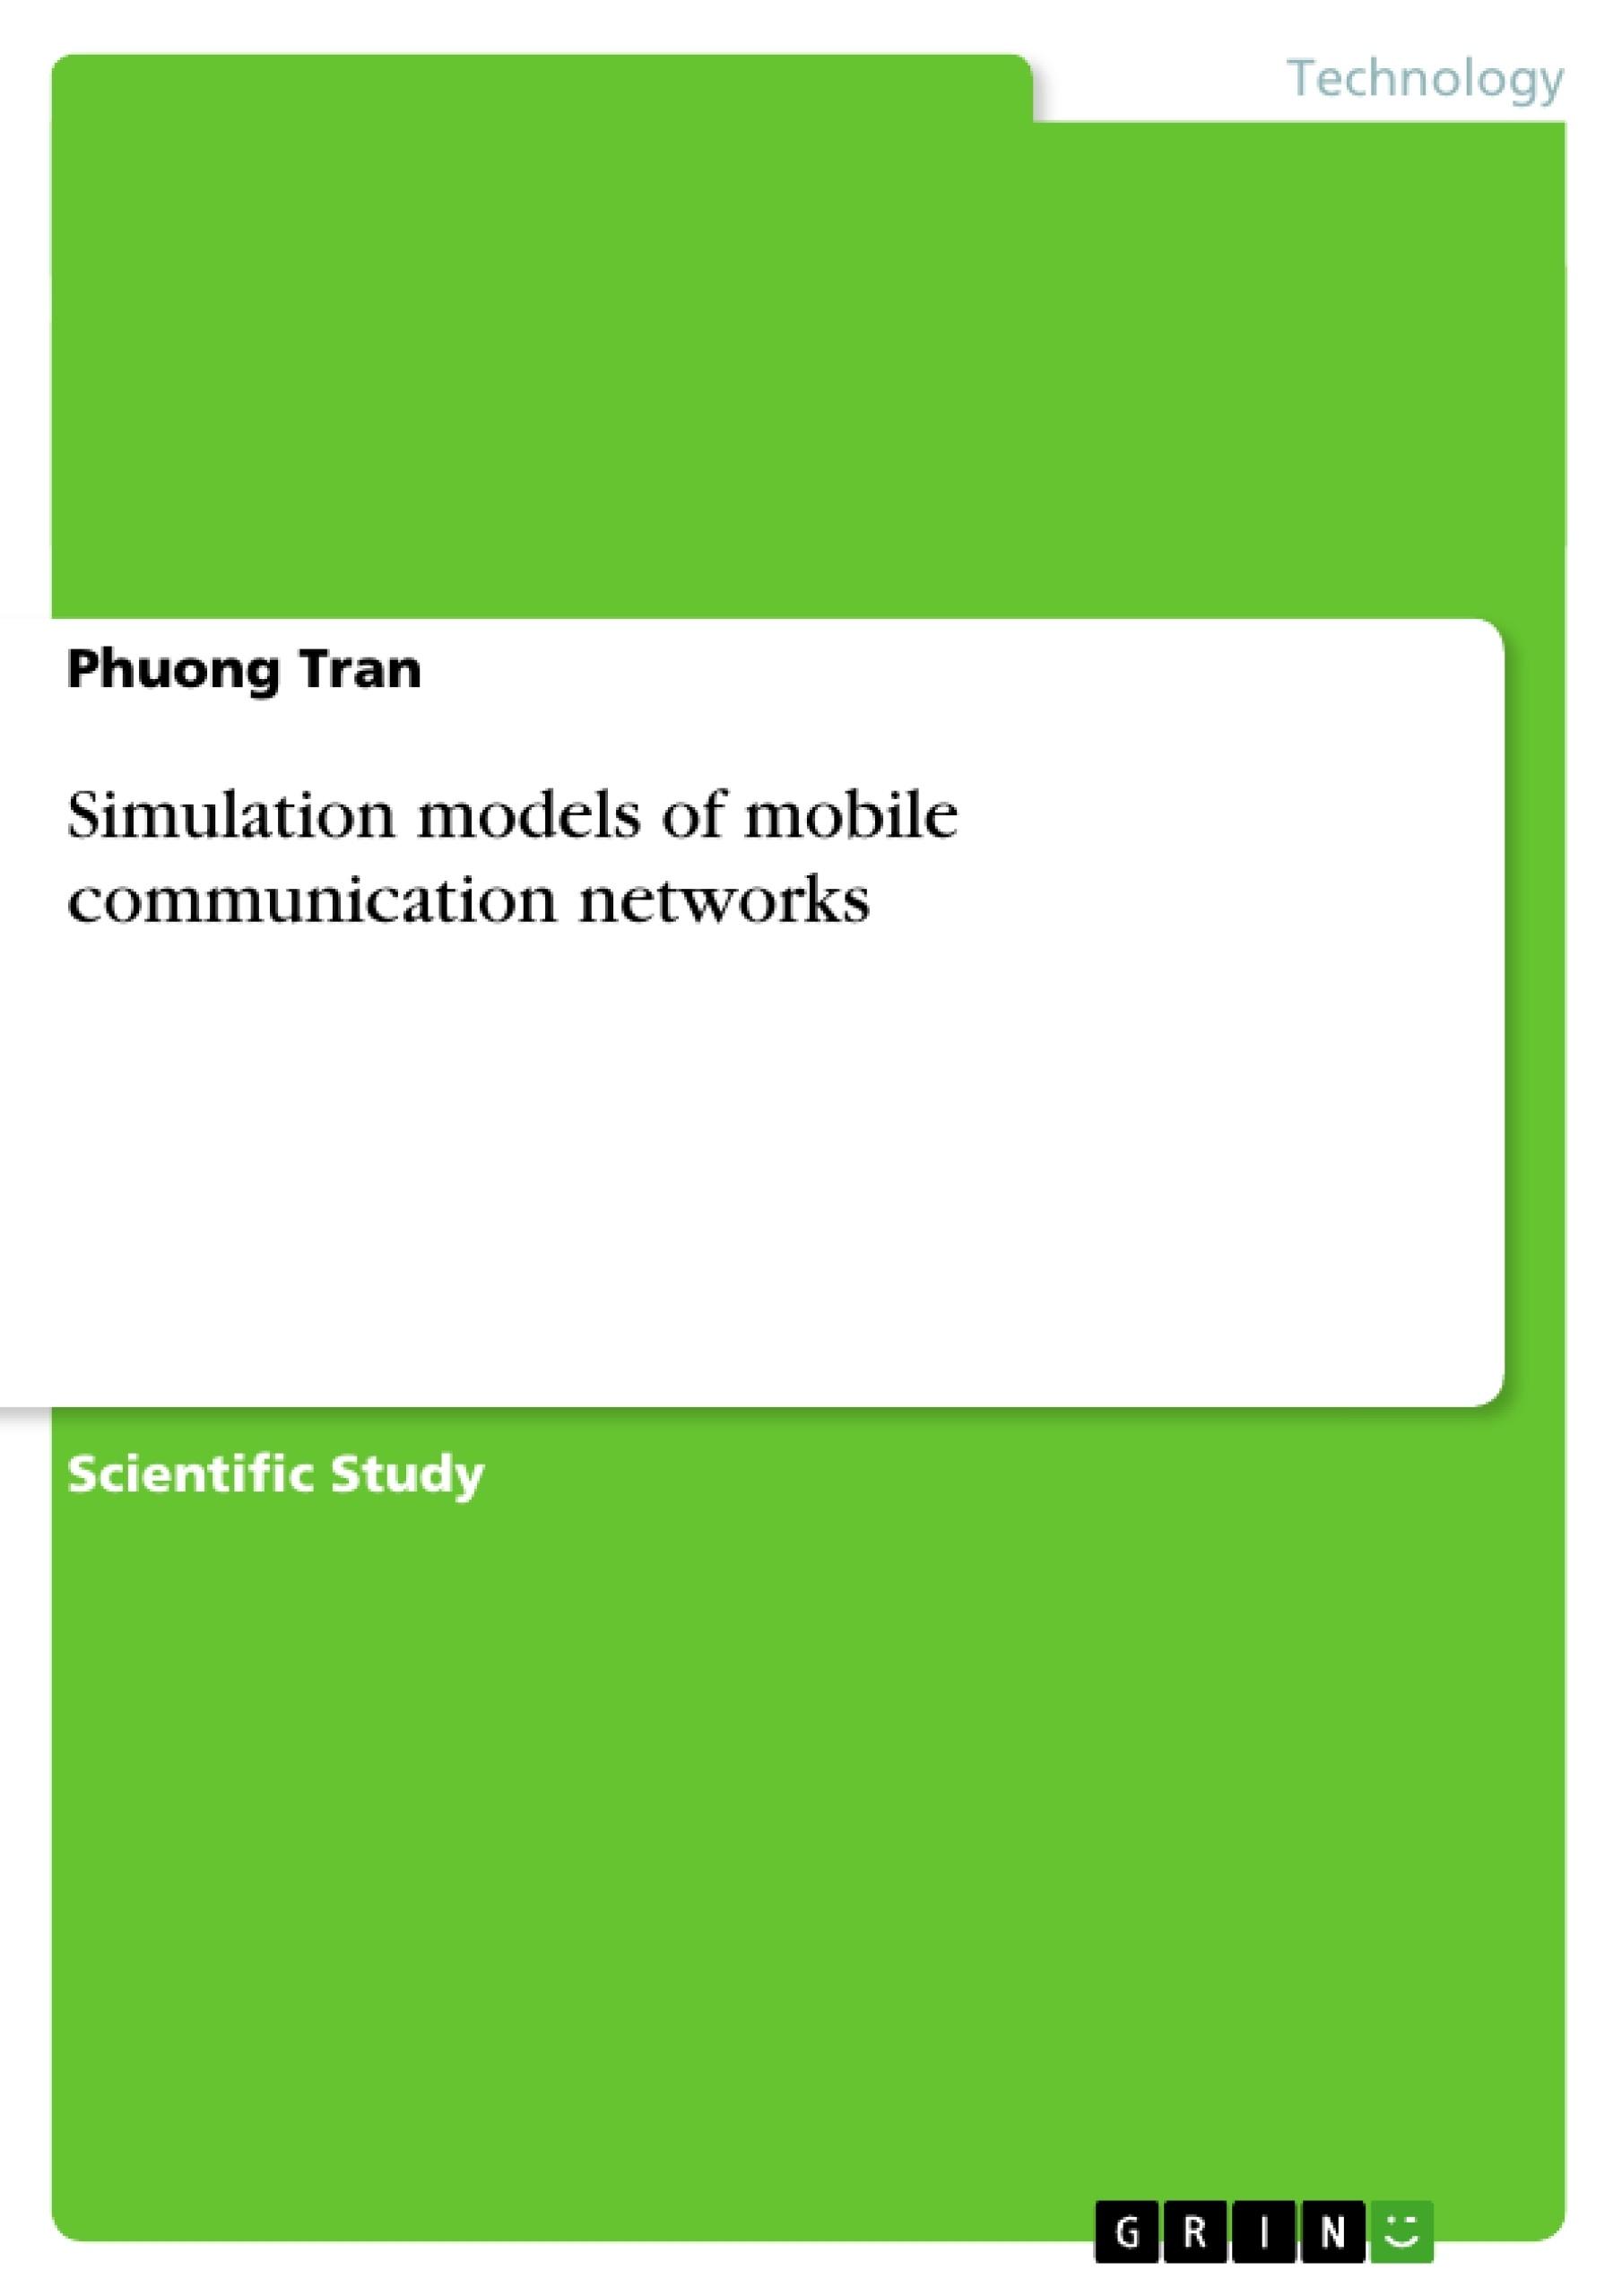 Title: Simulation models of mobile communication networks